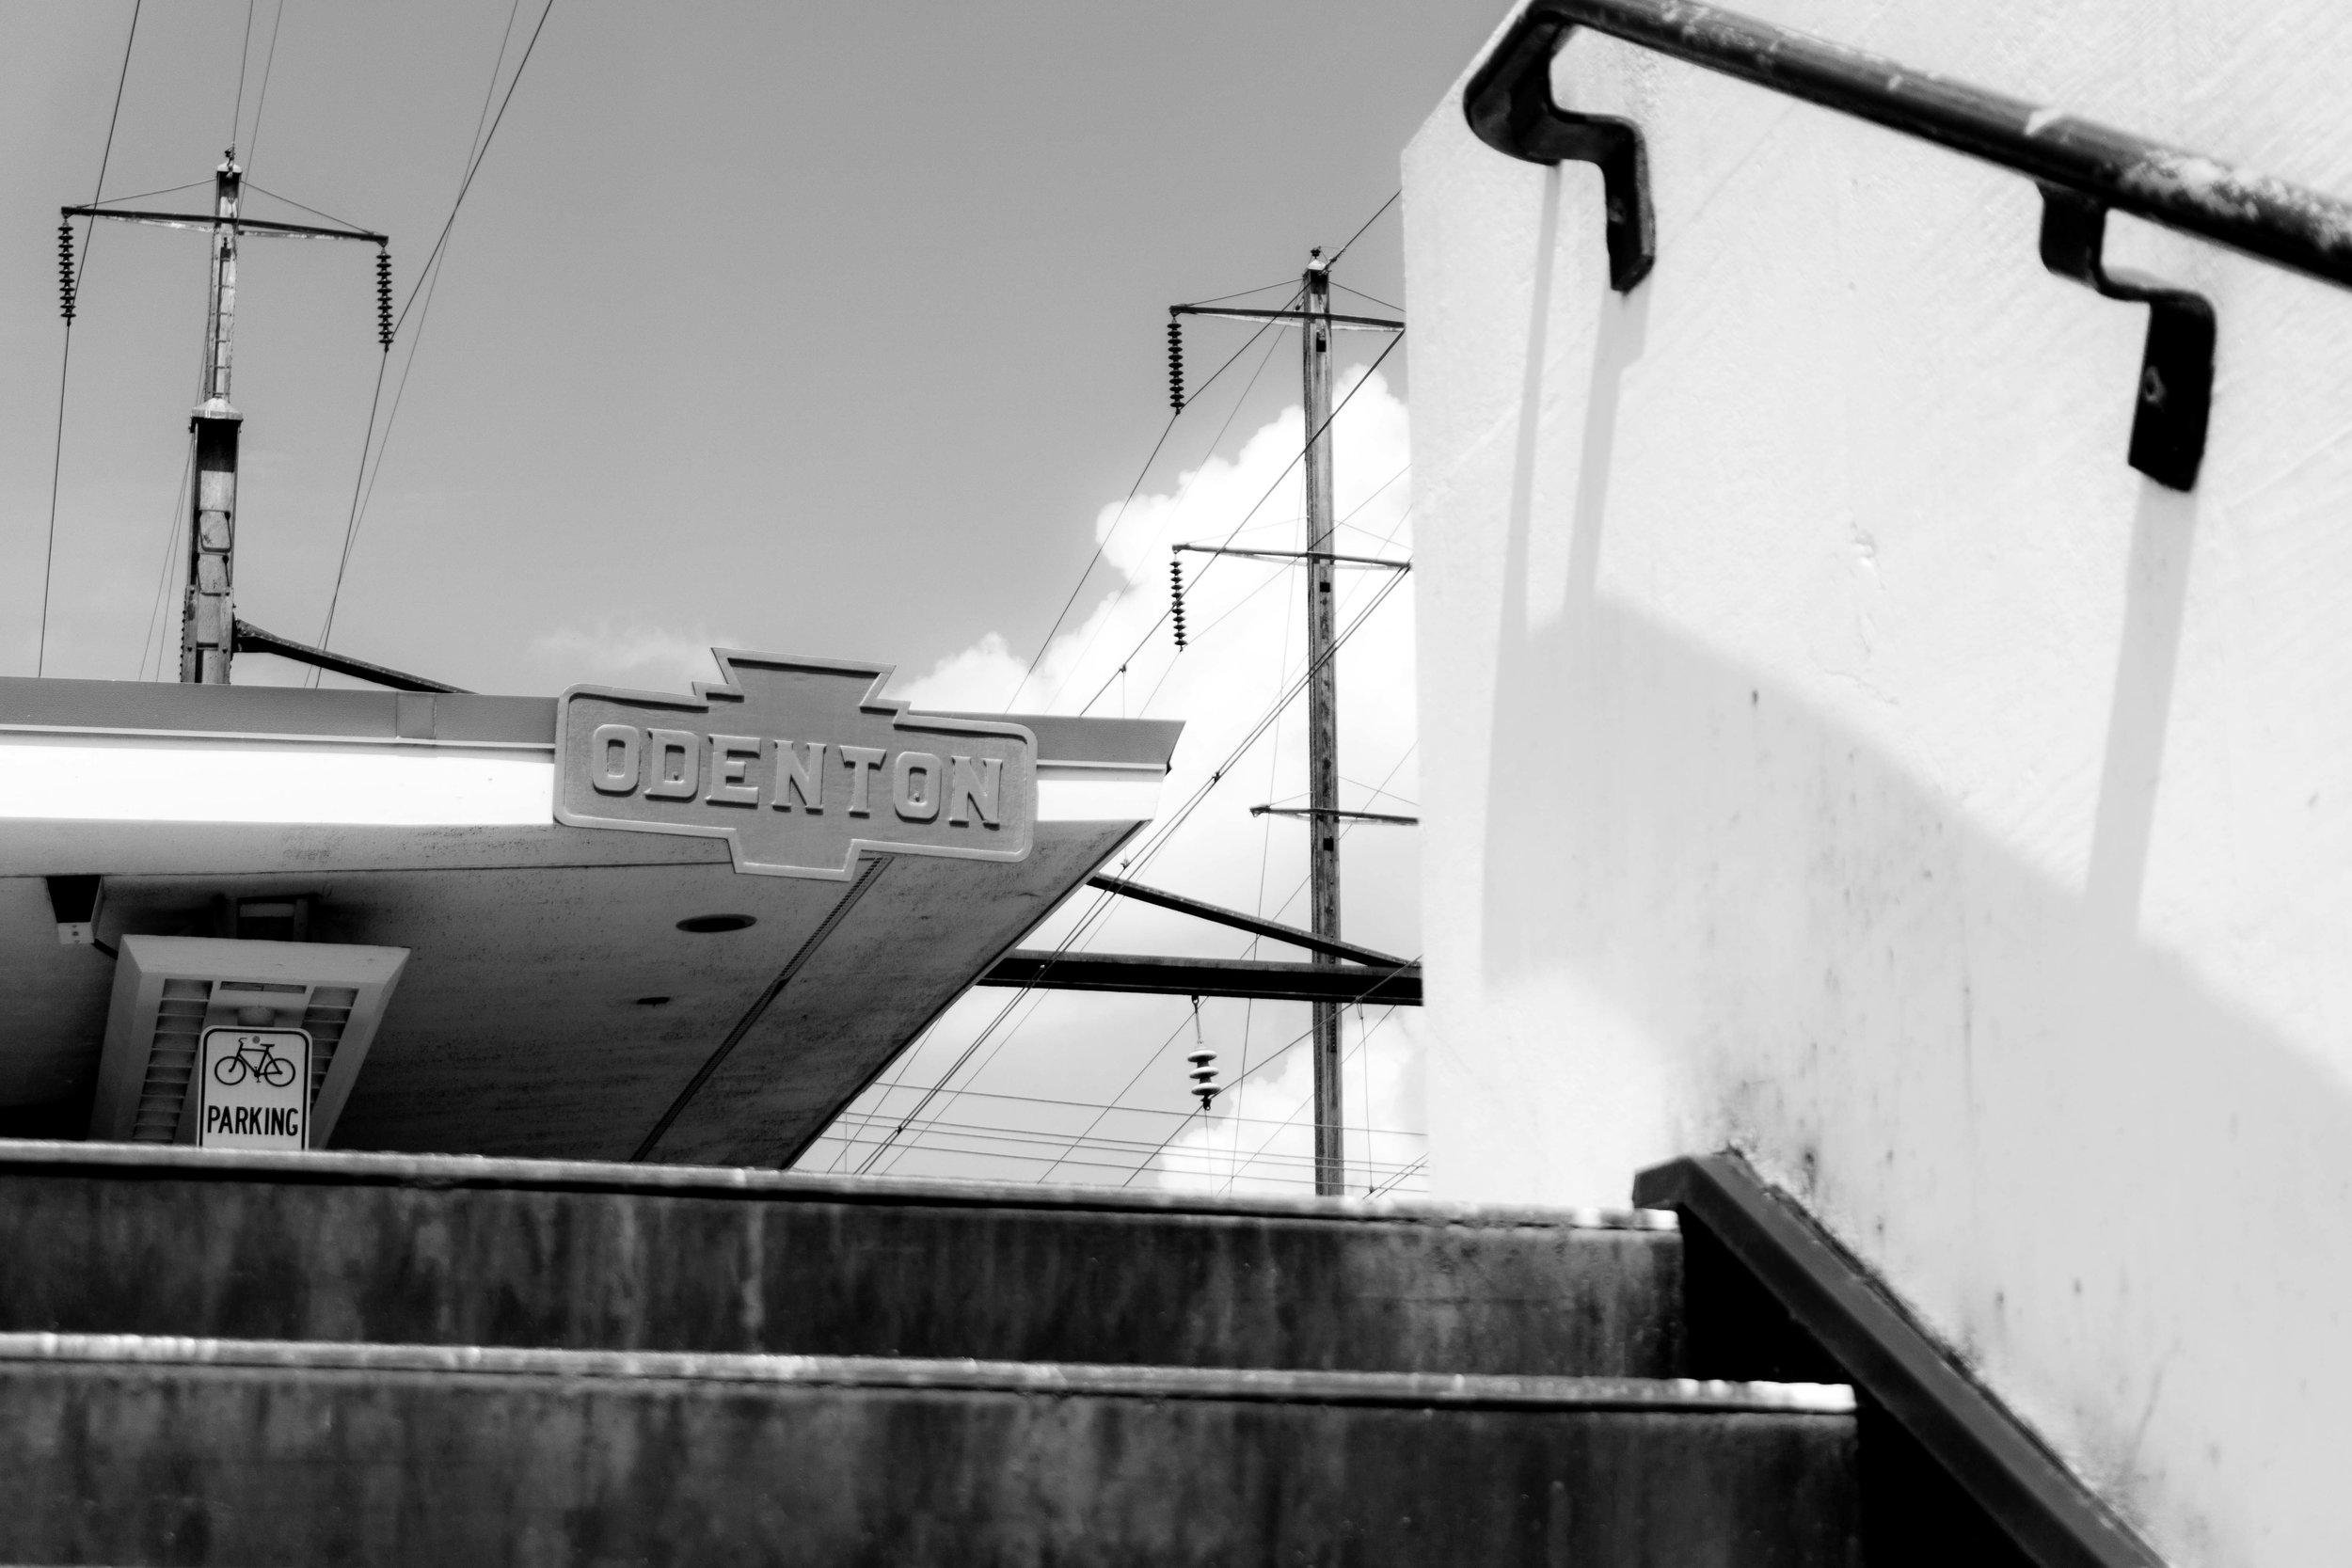 Odenton Marc Station